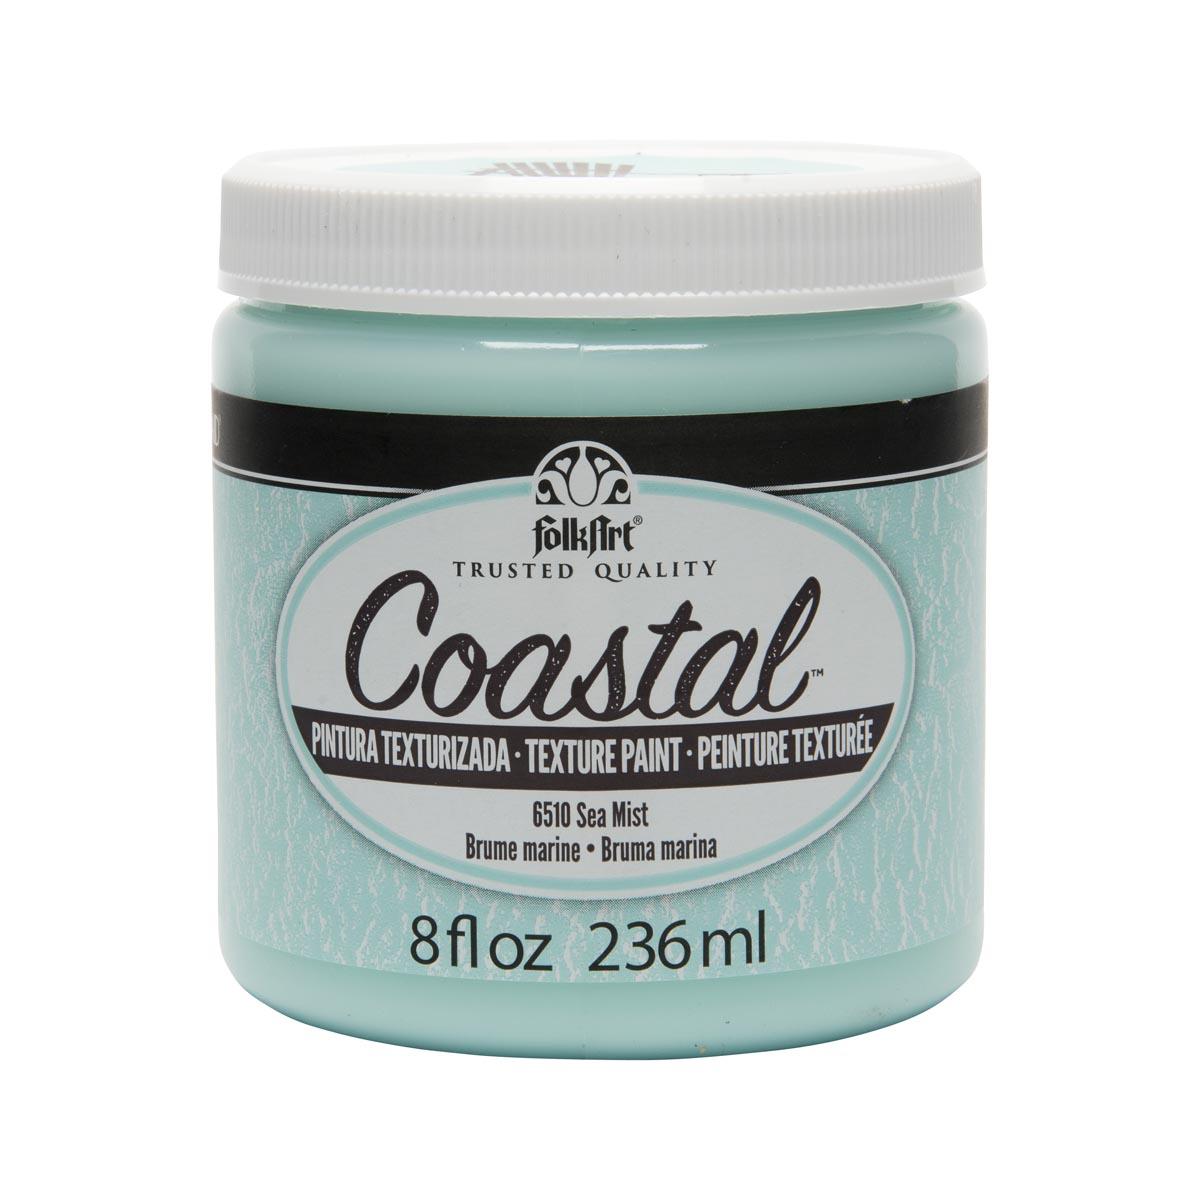 FolkArt ® Coastal™ Texture Paint - Sea Mist, 8 oz. - 6510